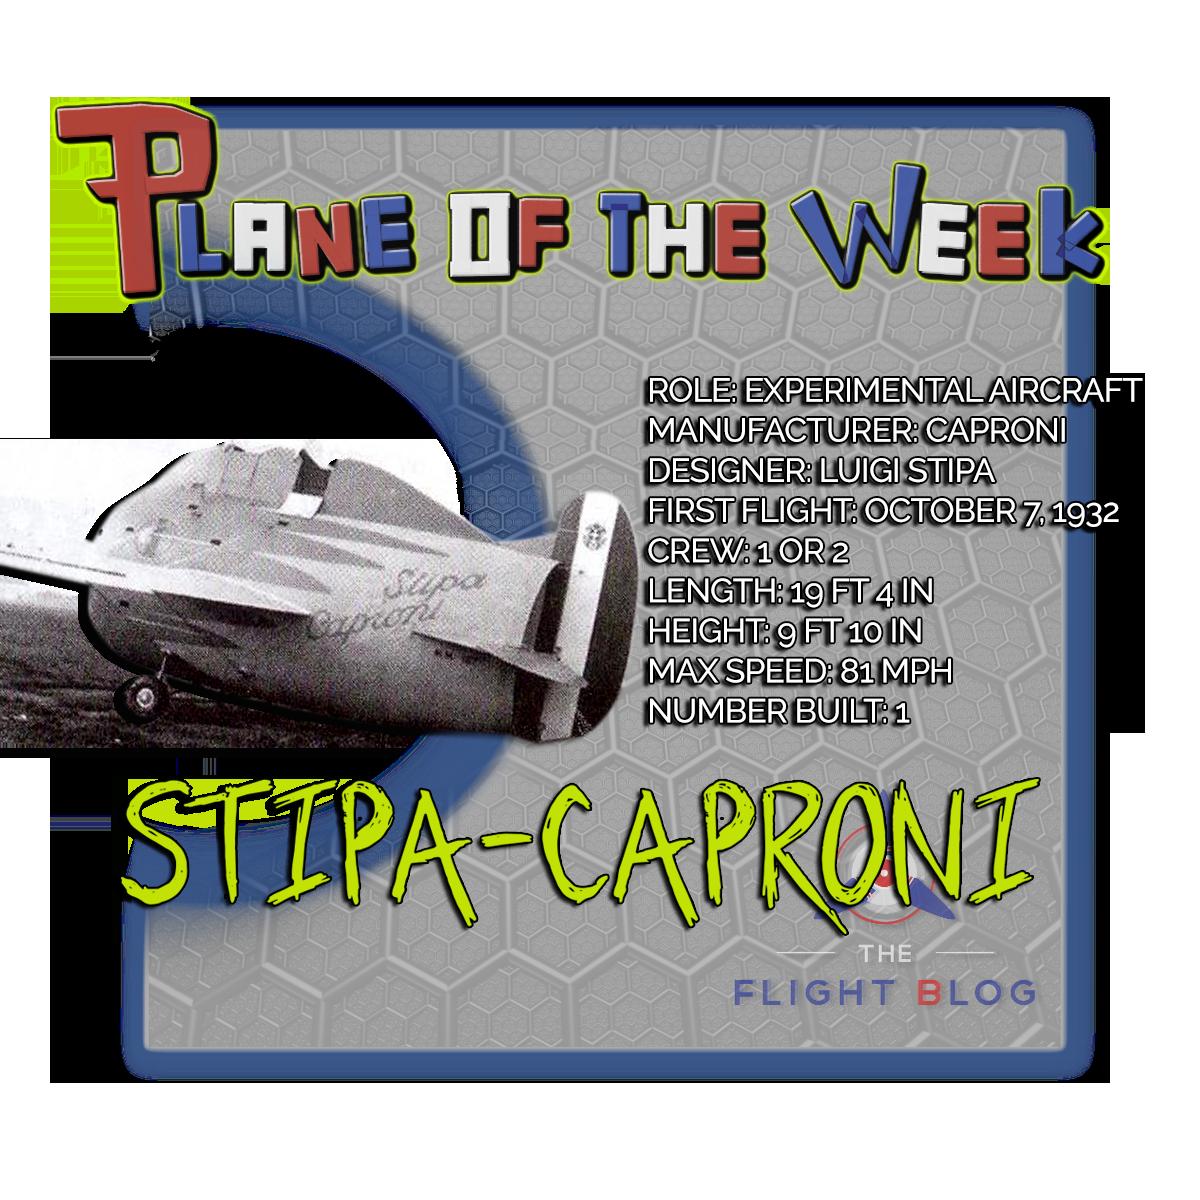 stipa-caproni, stipa caproni, experimental aircraft, plane specs, italian aircraft